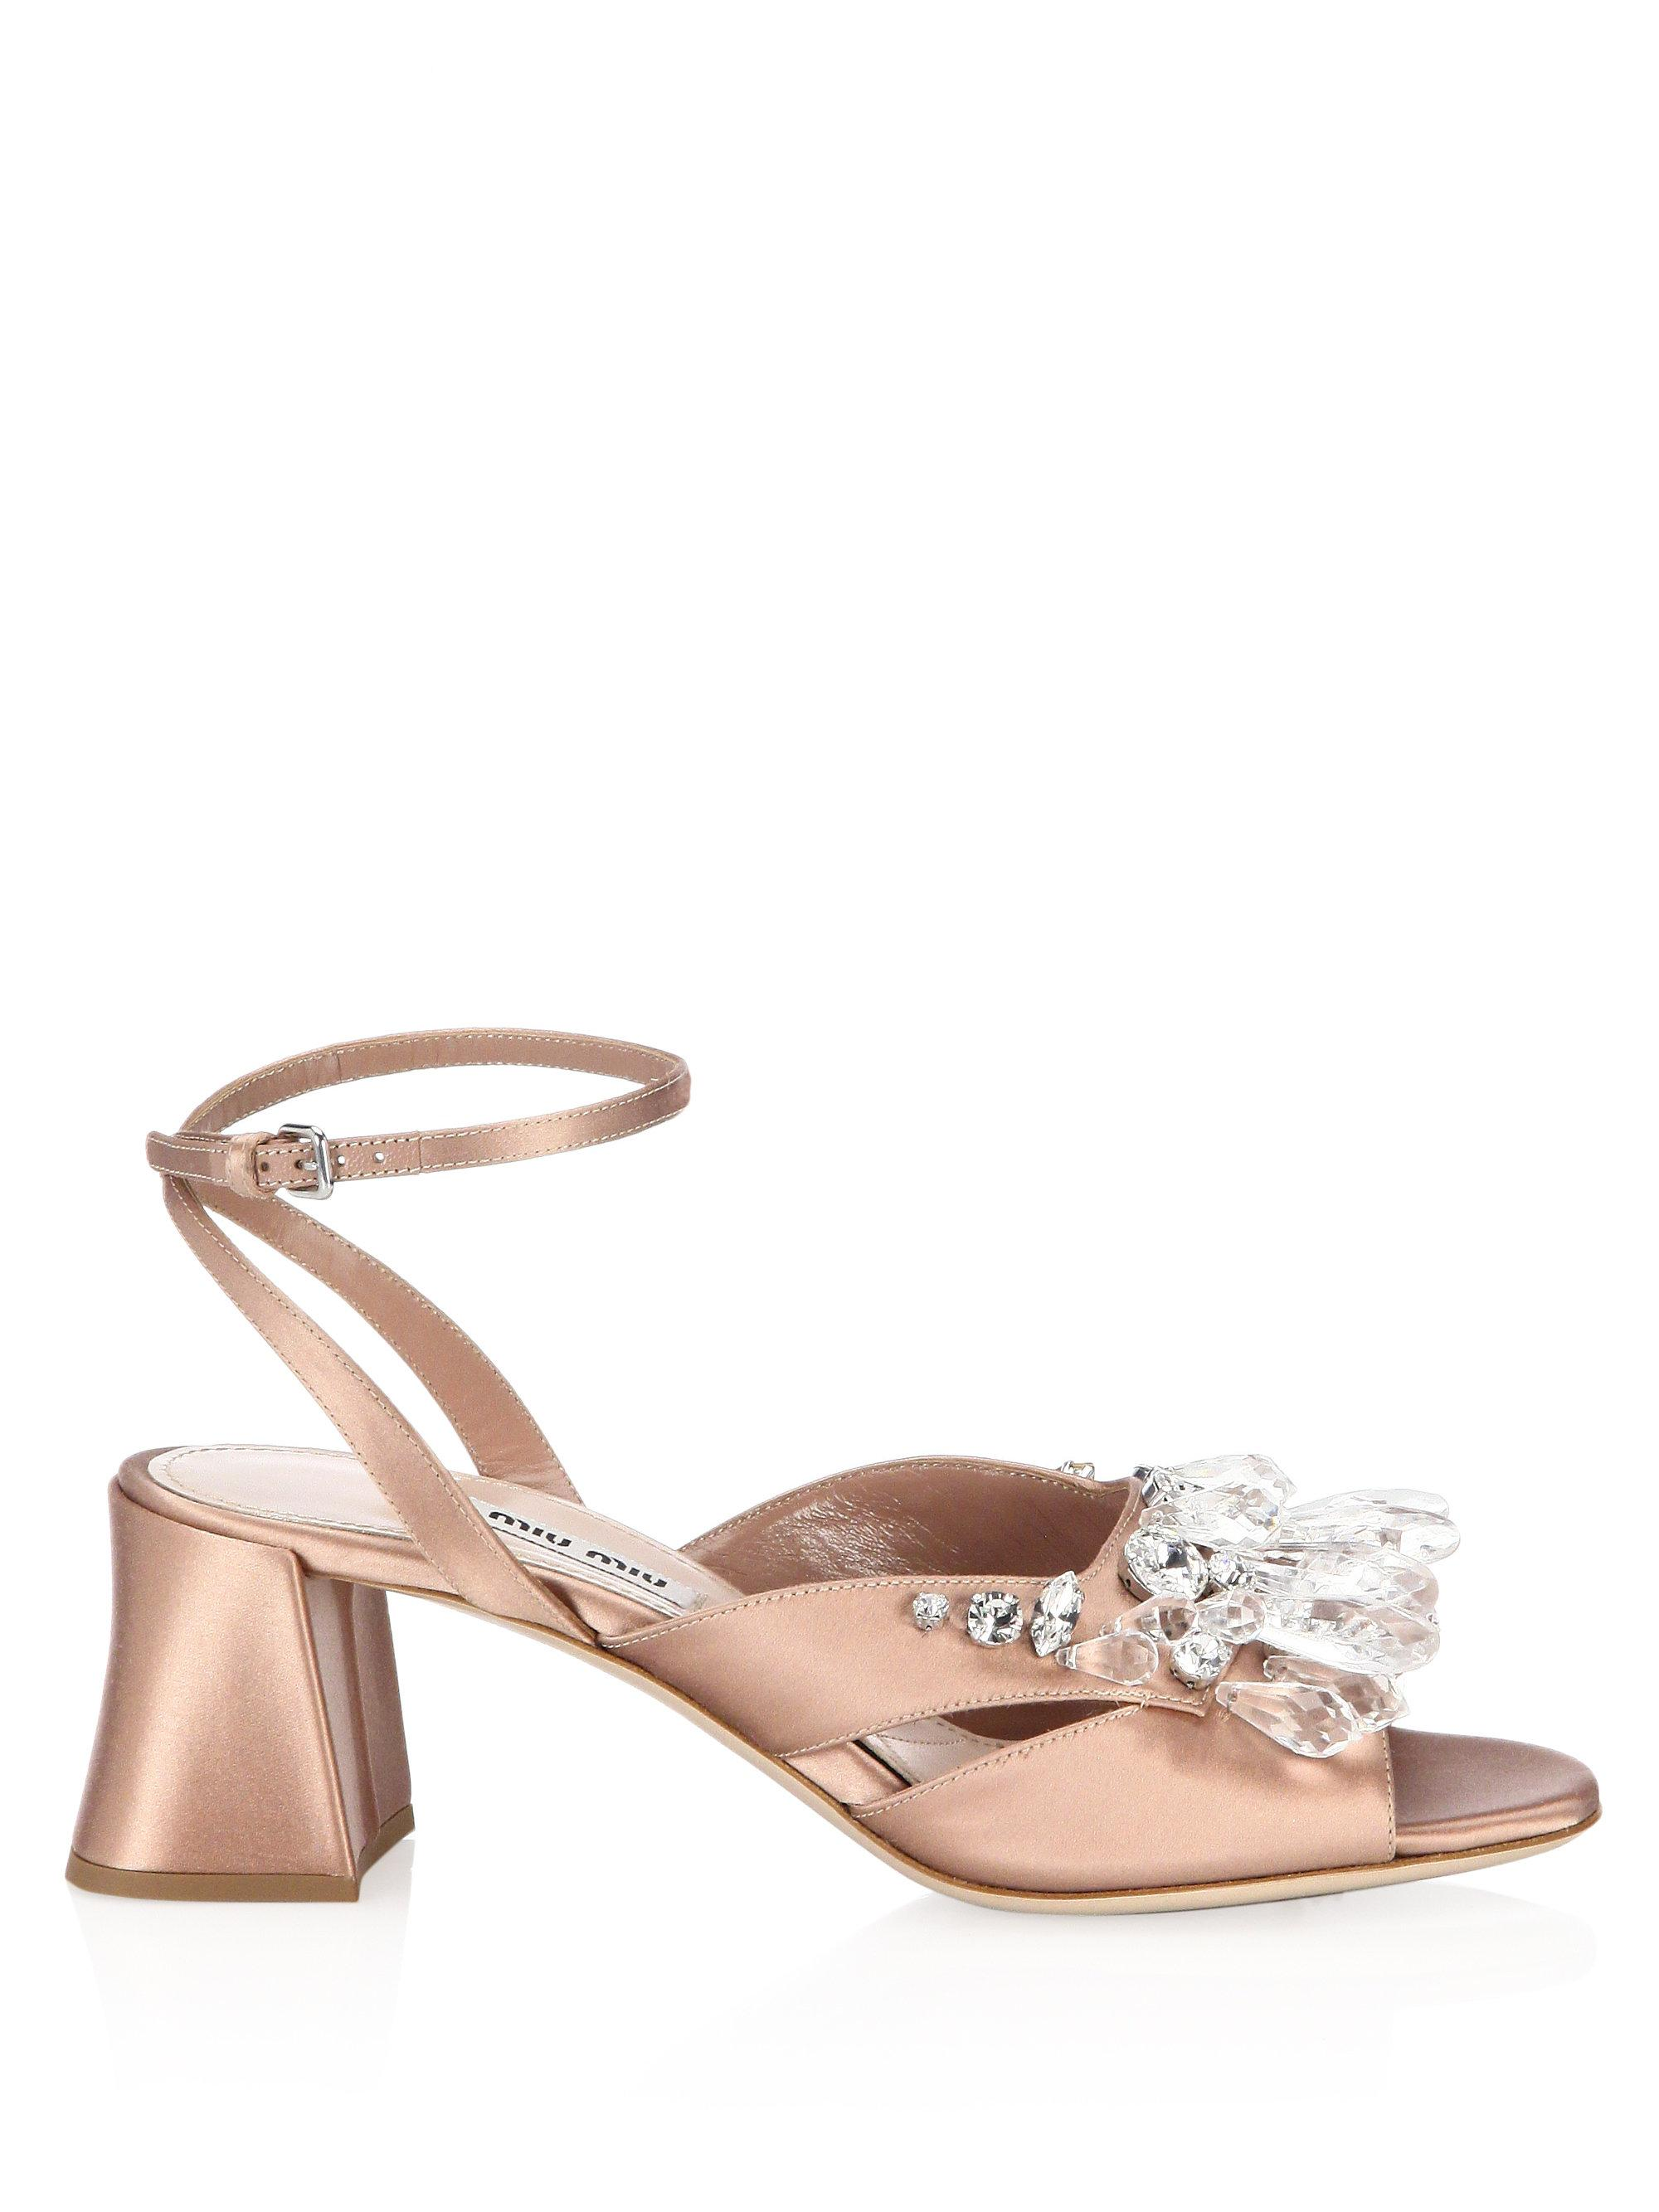 465096afe0 Miu Miu Crystal Block Heel Sandals in Natural - Lyst